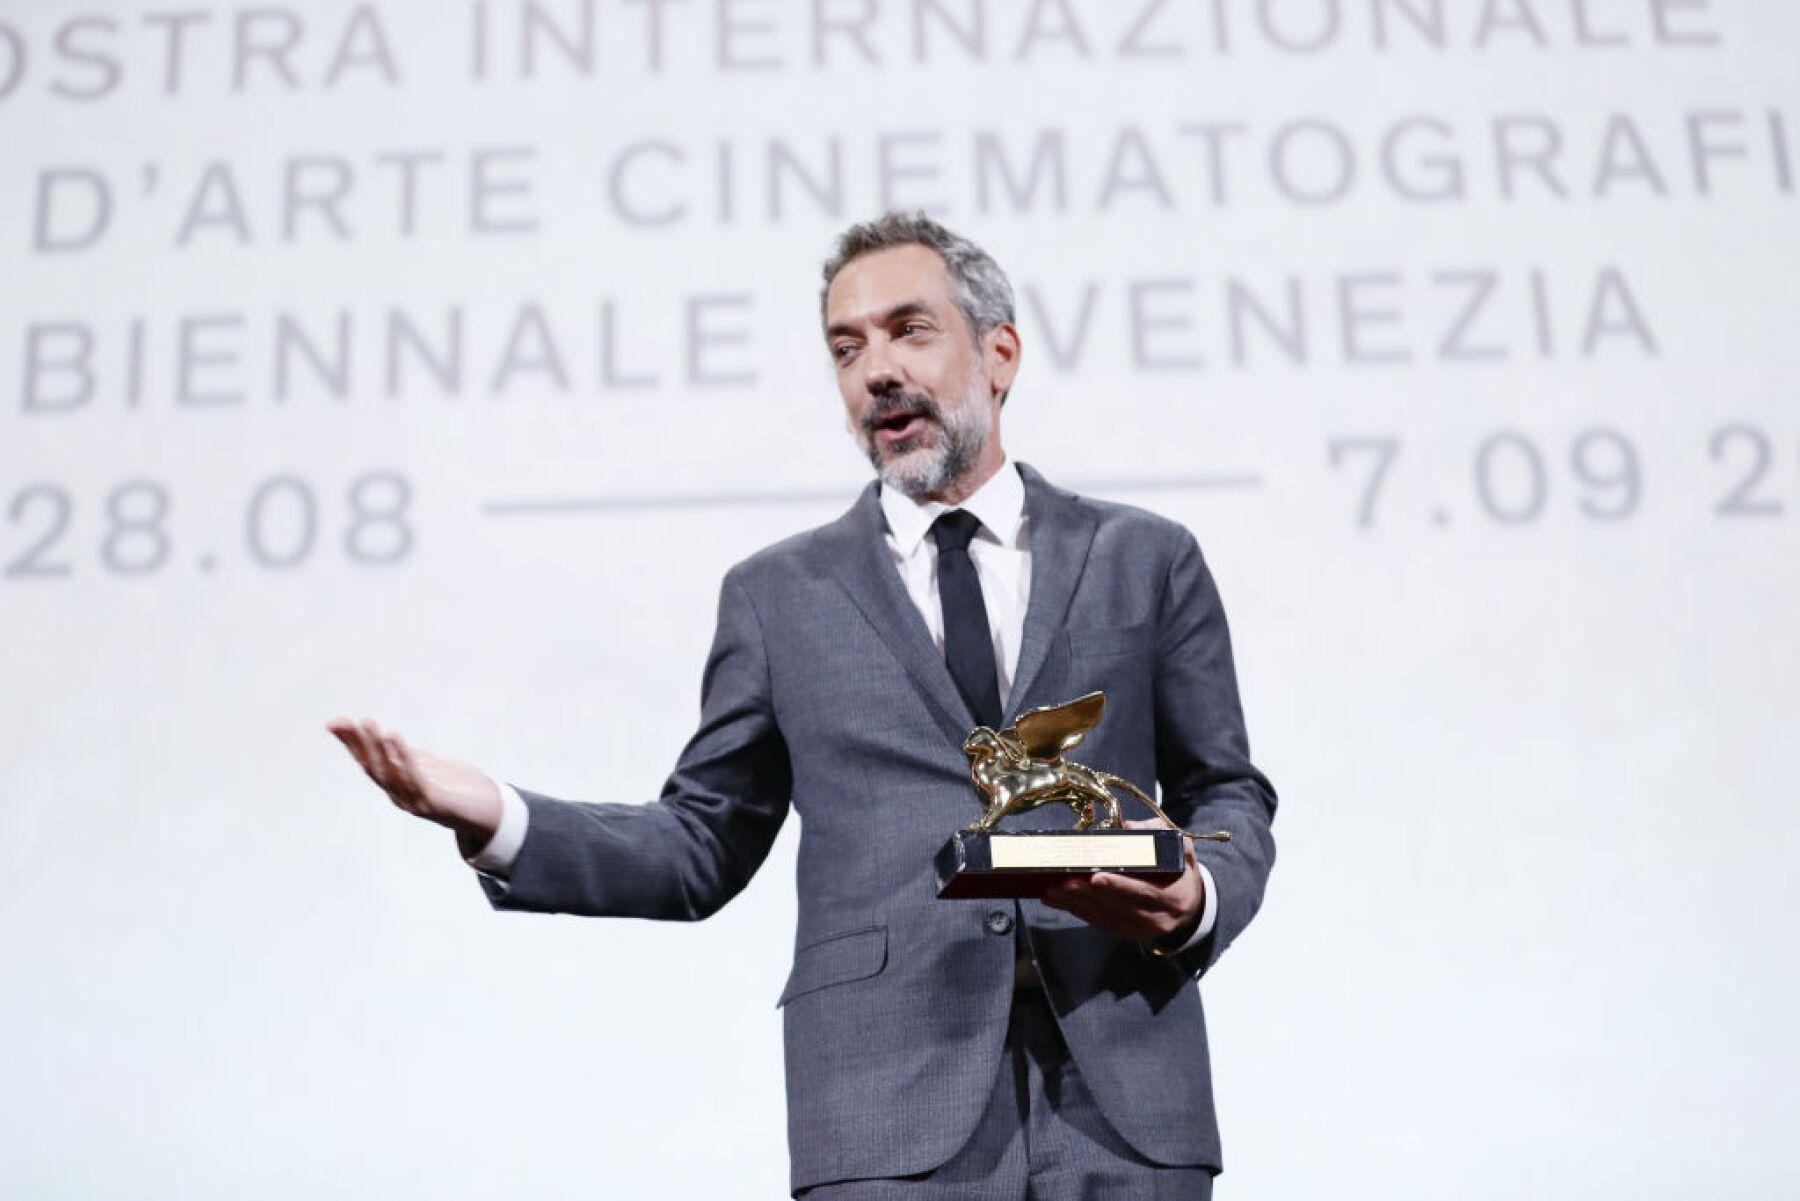 Award Ceremony - The 76th Venice Film Festival